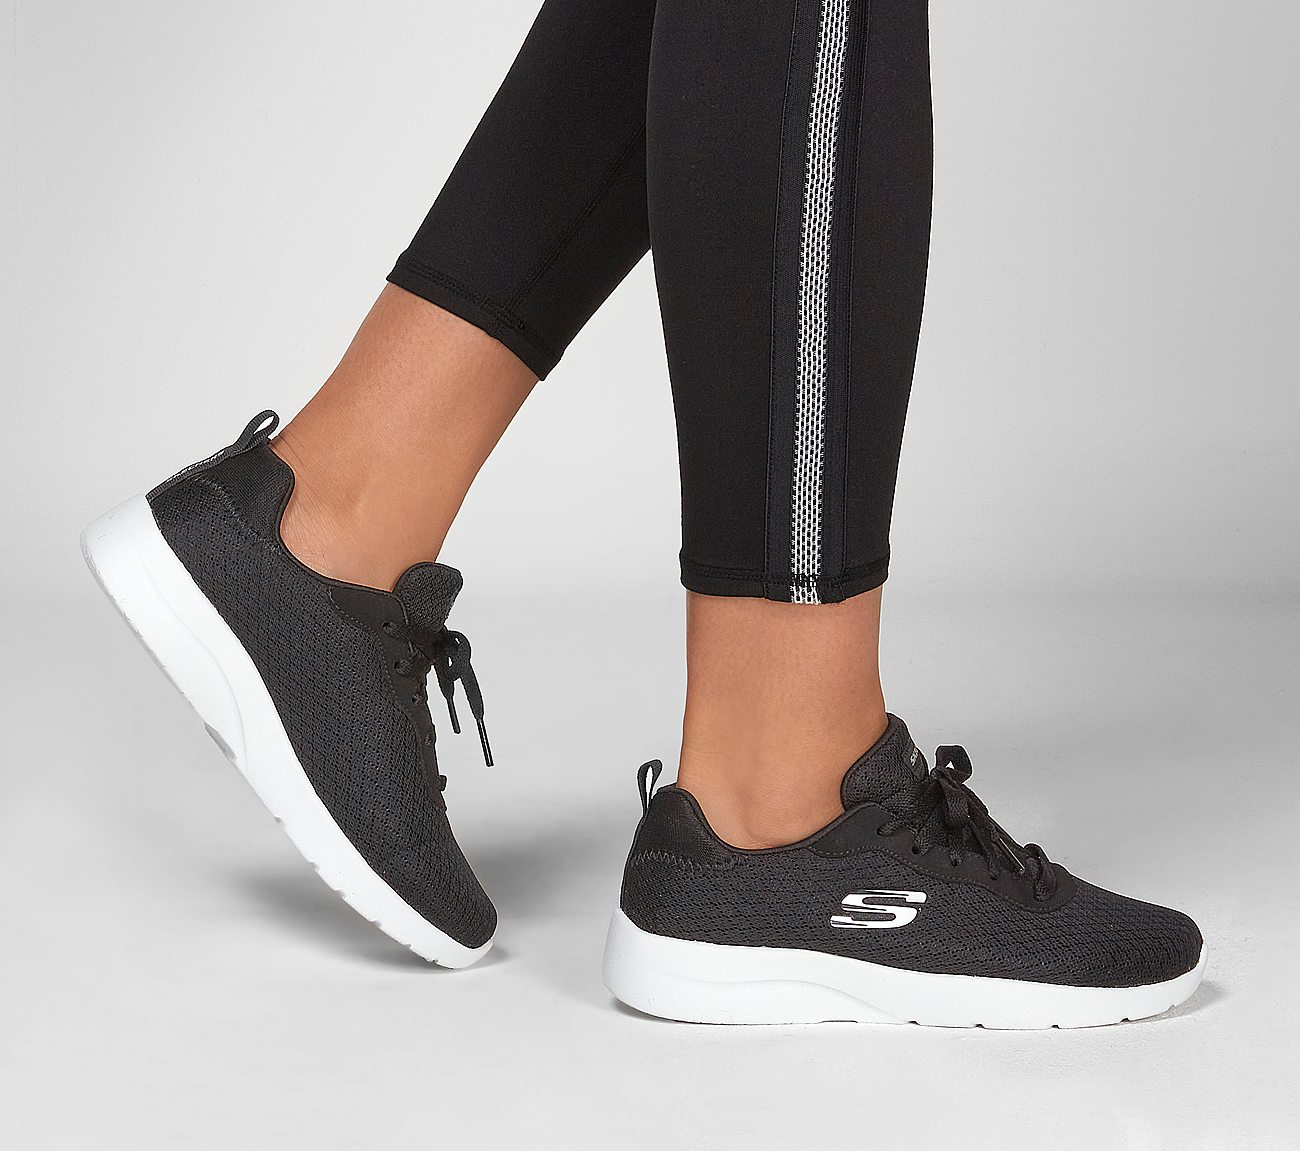 bd188b7e9219dc Buy SKECHERS Dynamight 2.0 - Eye to Eye Sport Shoes only $46.00